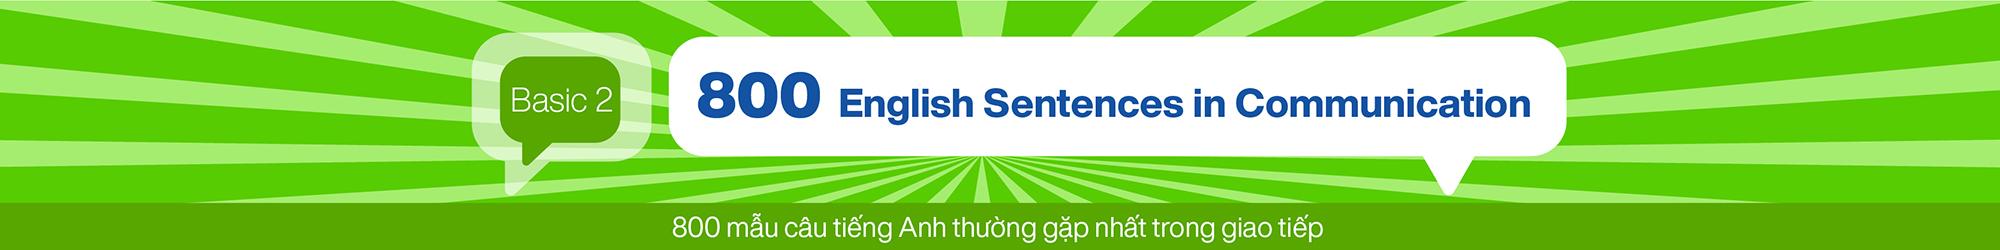 800 English Sentences in Communication (Basic 2) banner